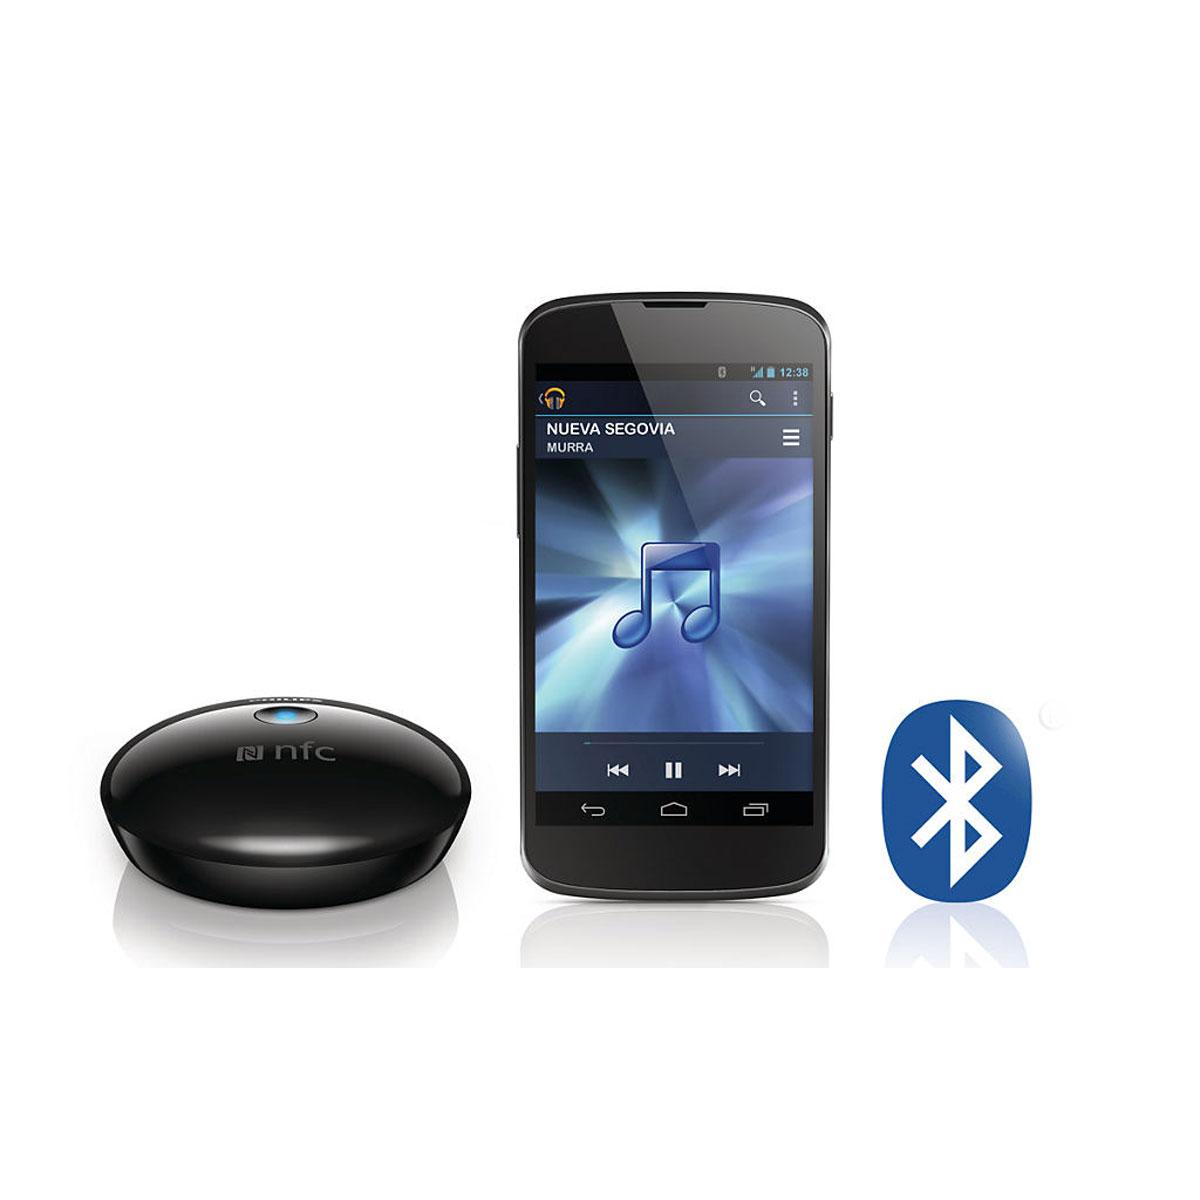 philips aea2500 aea2500 achat vente serveur audio sur. Black Bedroom Furniture Sets. Home Design Ideas